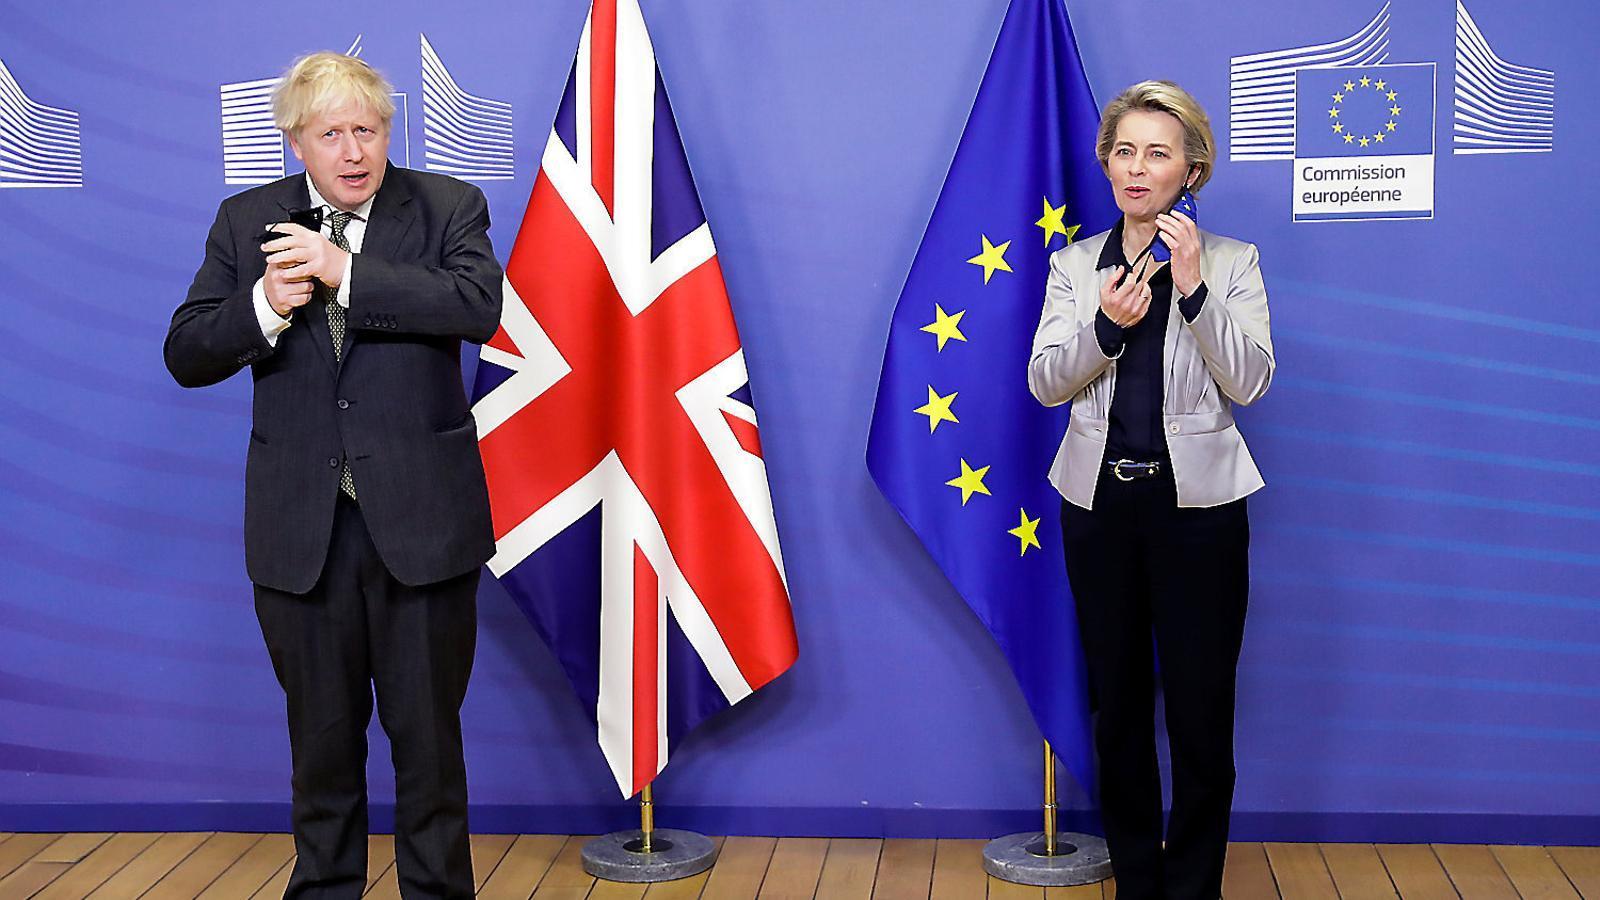 El primer ministre britànic, Boris Johnson, i la presidenta de la Comissió, Ursula von der Leyen ahir.